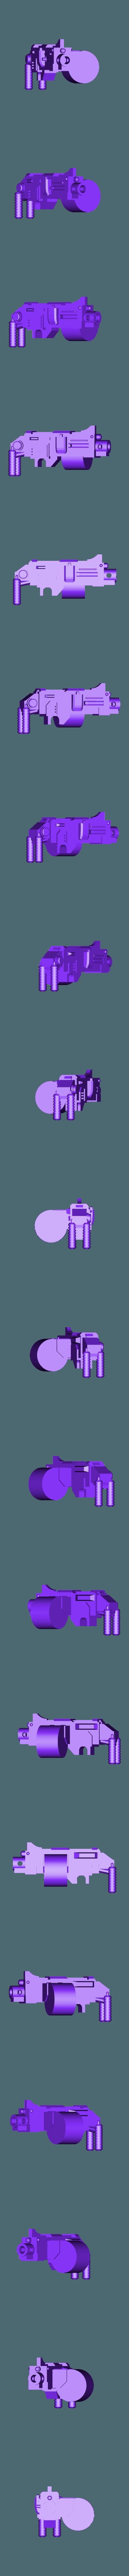 SpeederMachineGun.stl Download free STL file Angry Air - Frugal Displeased Soldier Deployment Vessel • 3D printing model, FelixTheCrazy